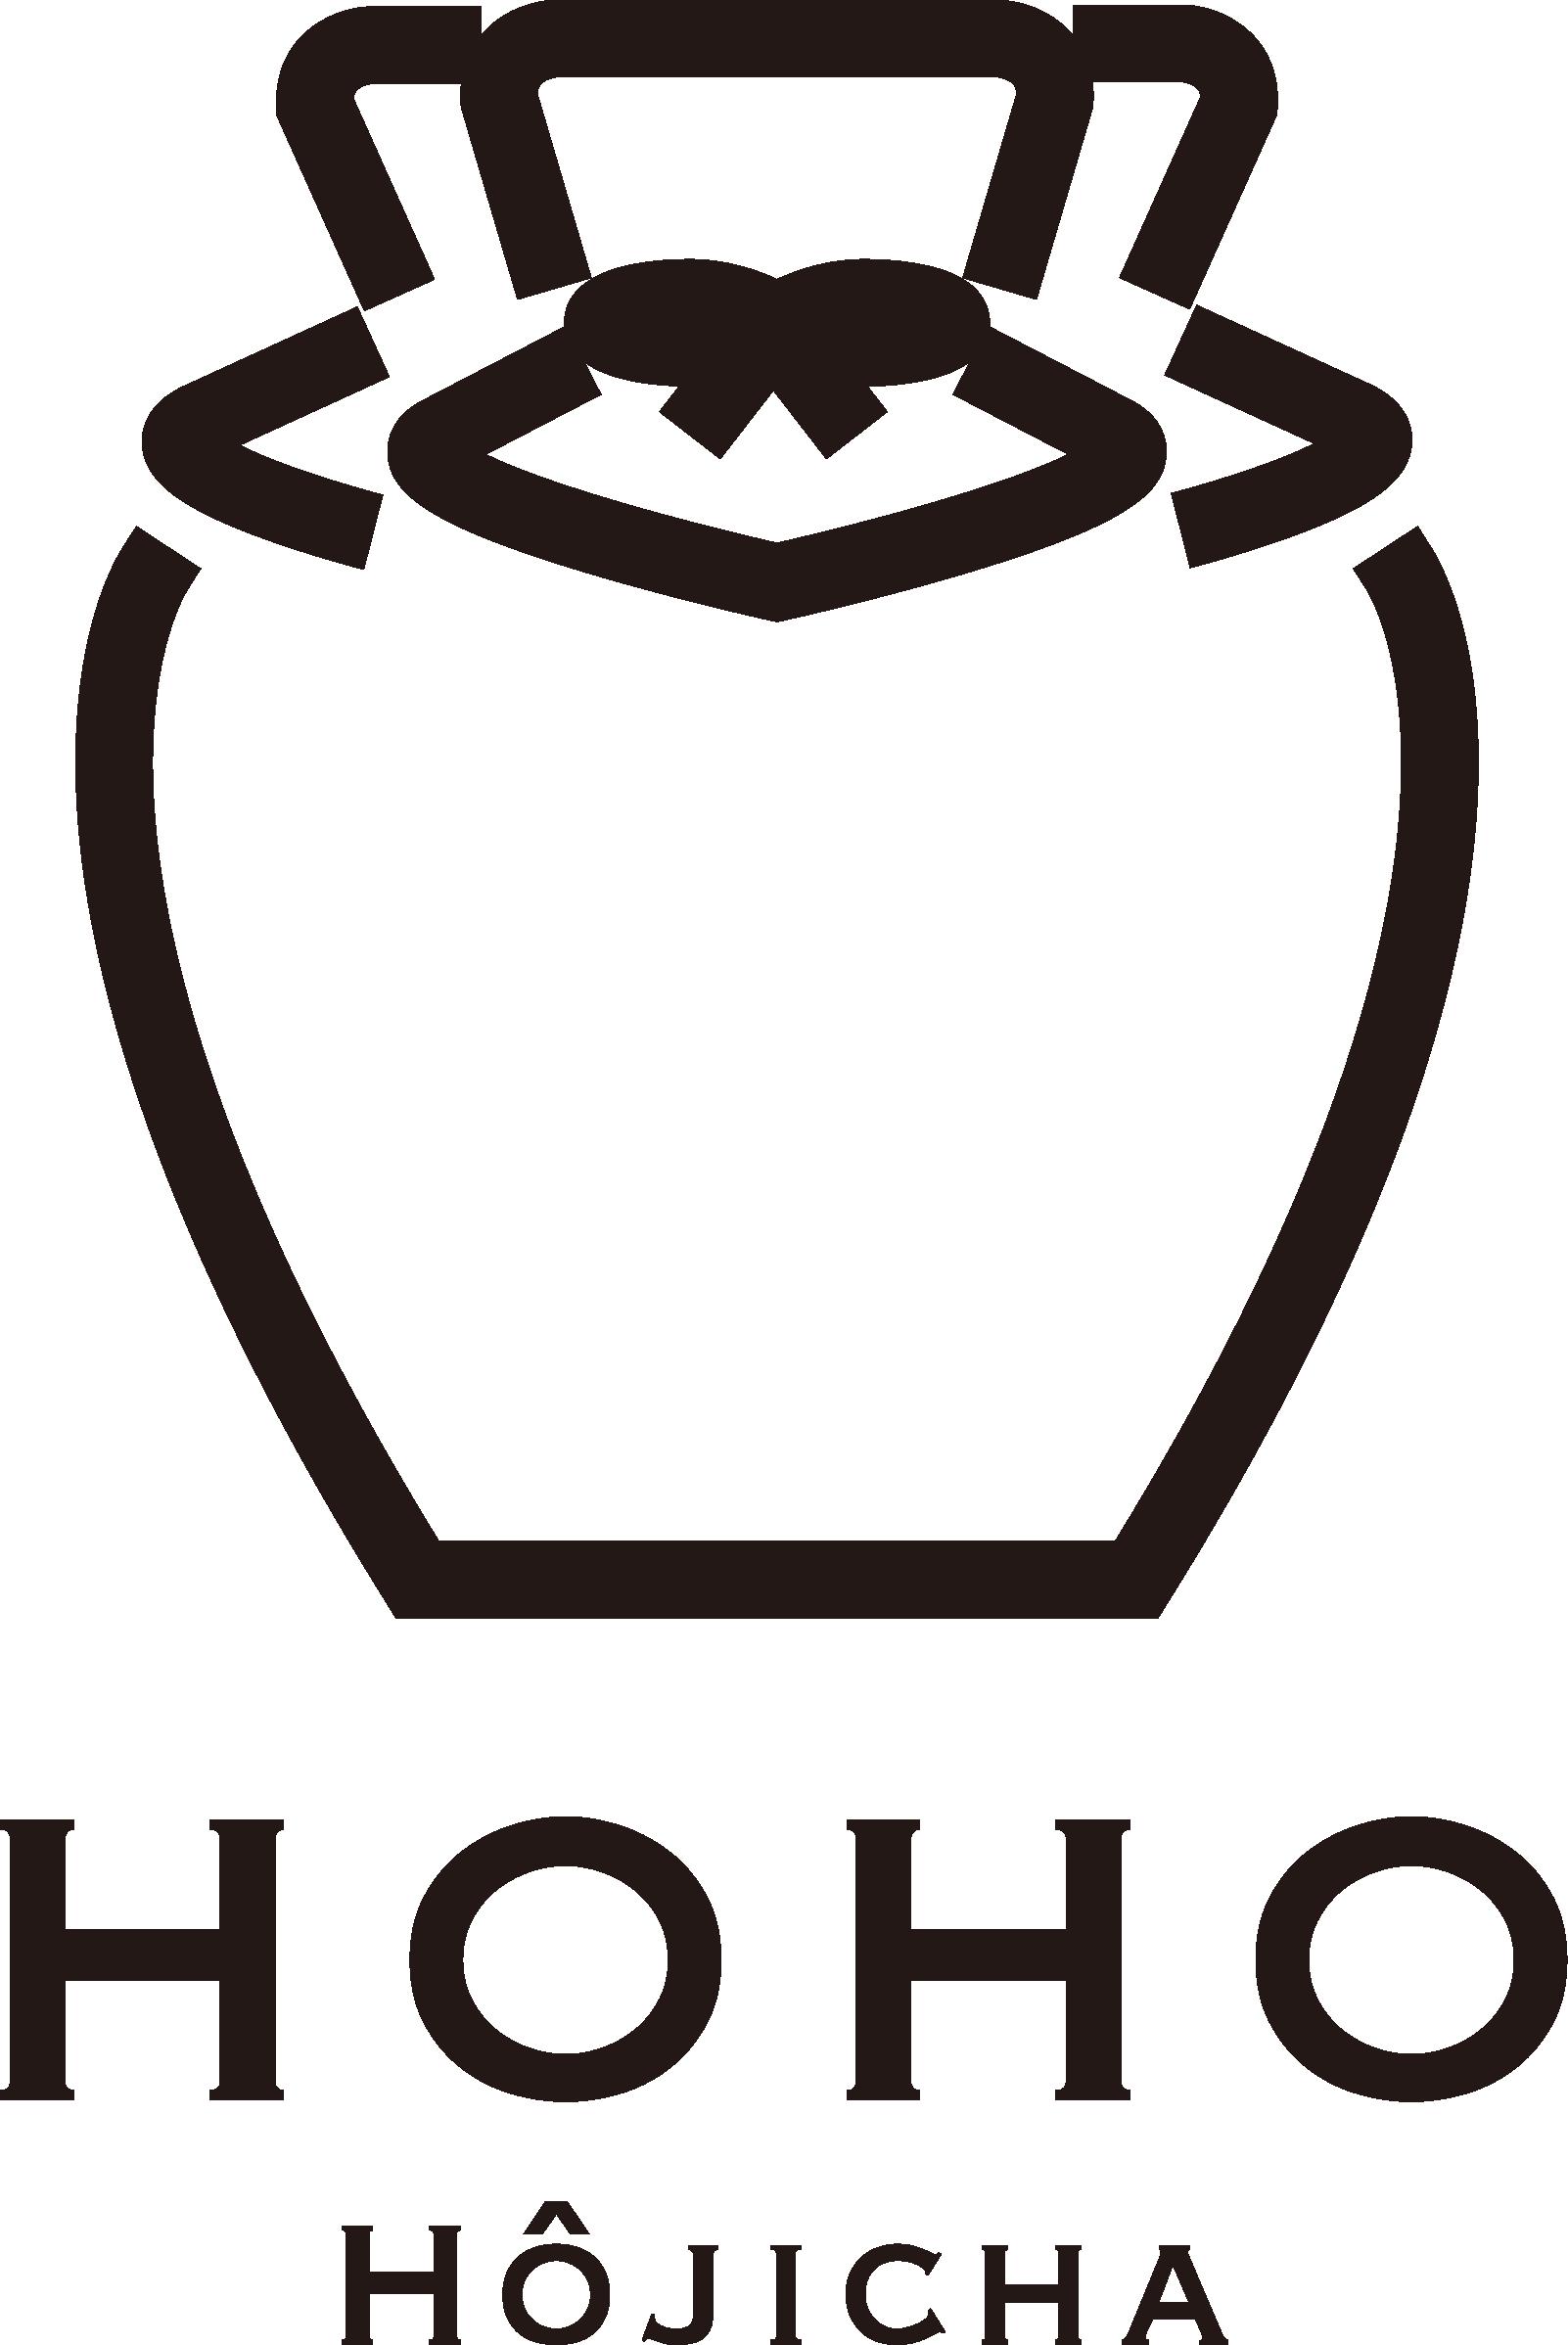 HOHO HOJICHA 焙茶専門店